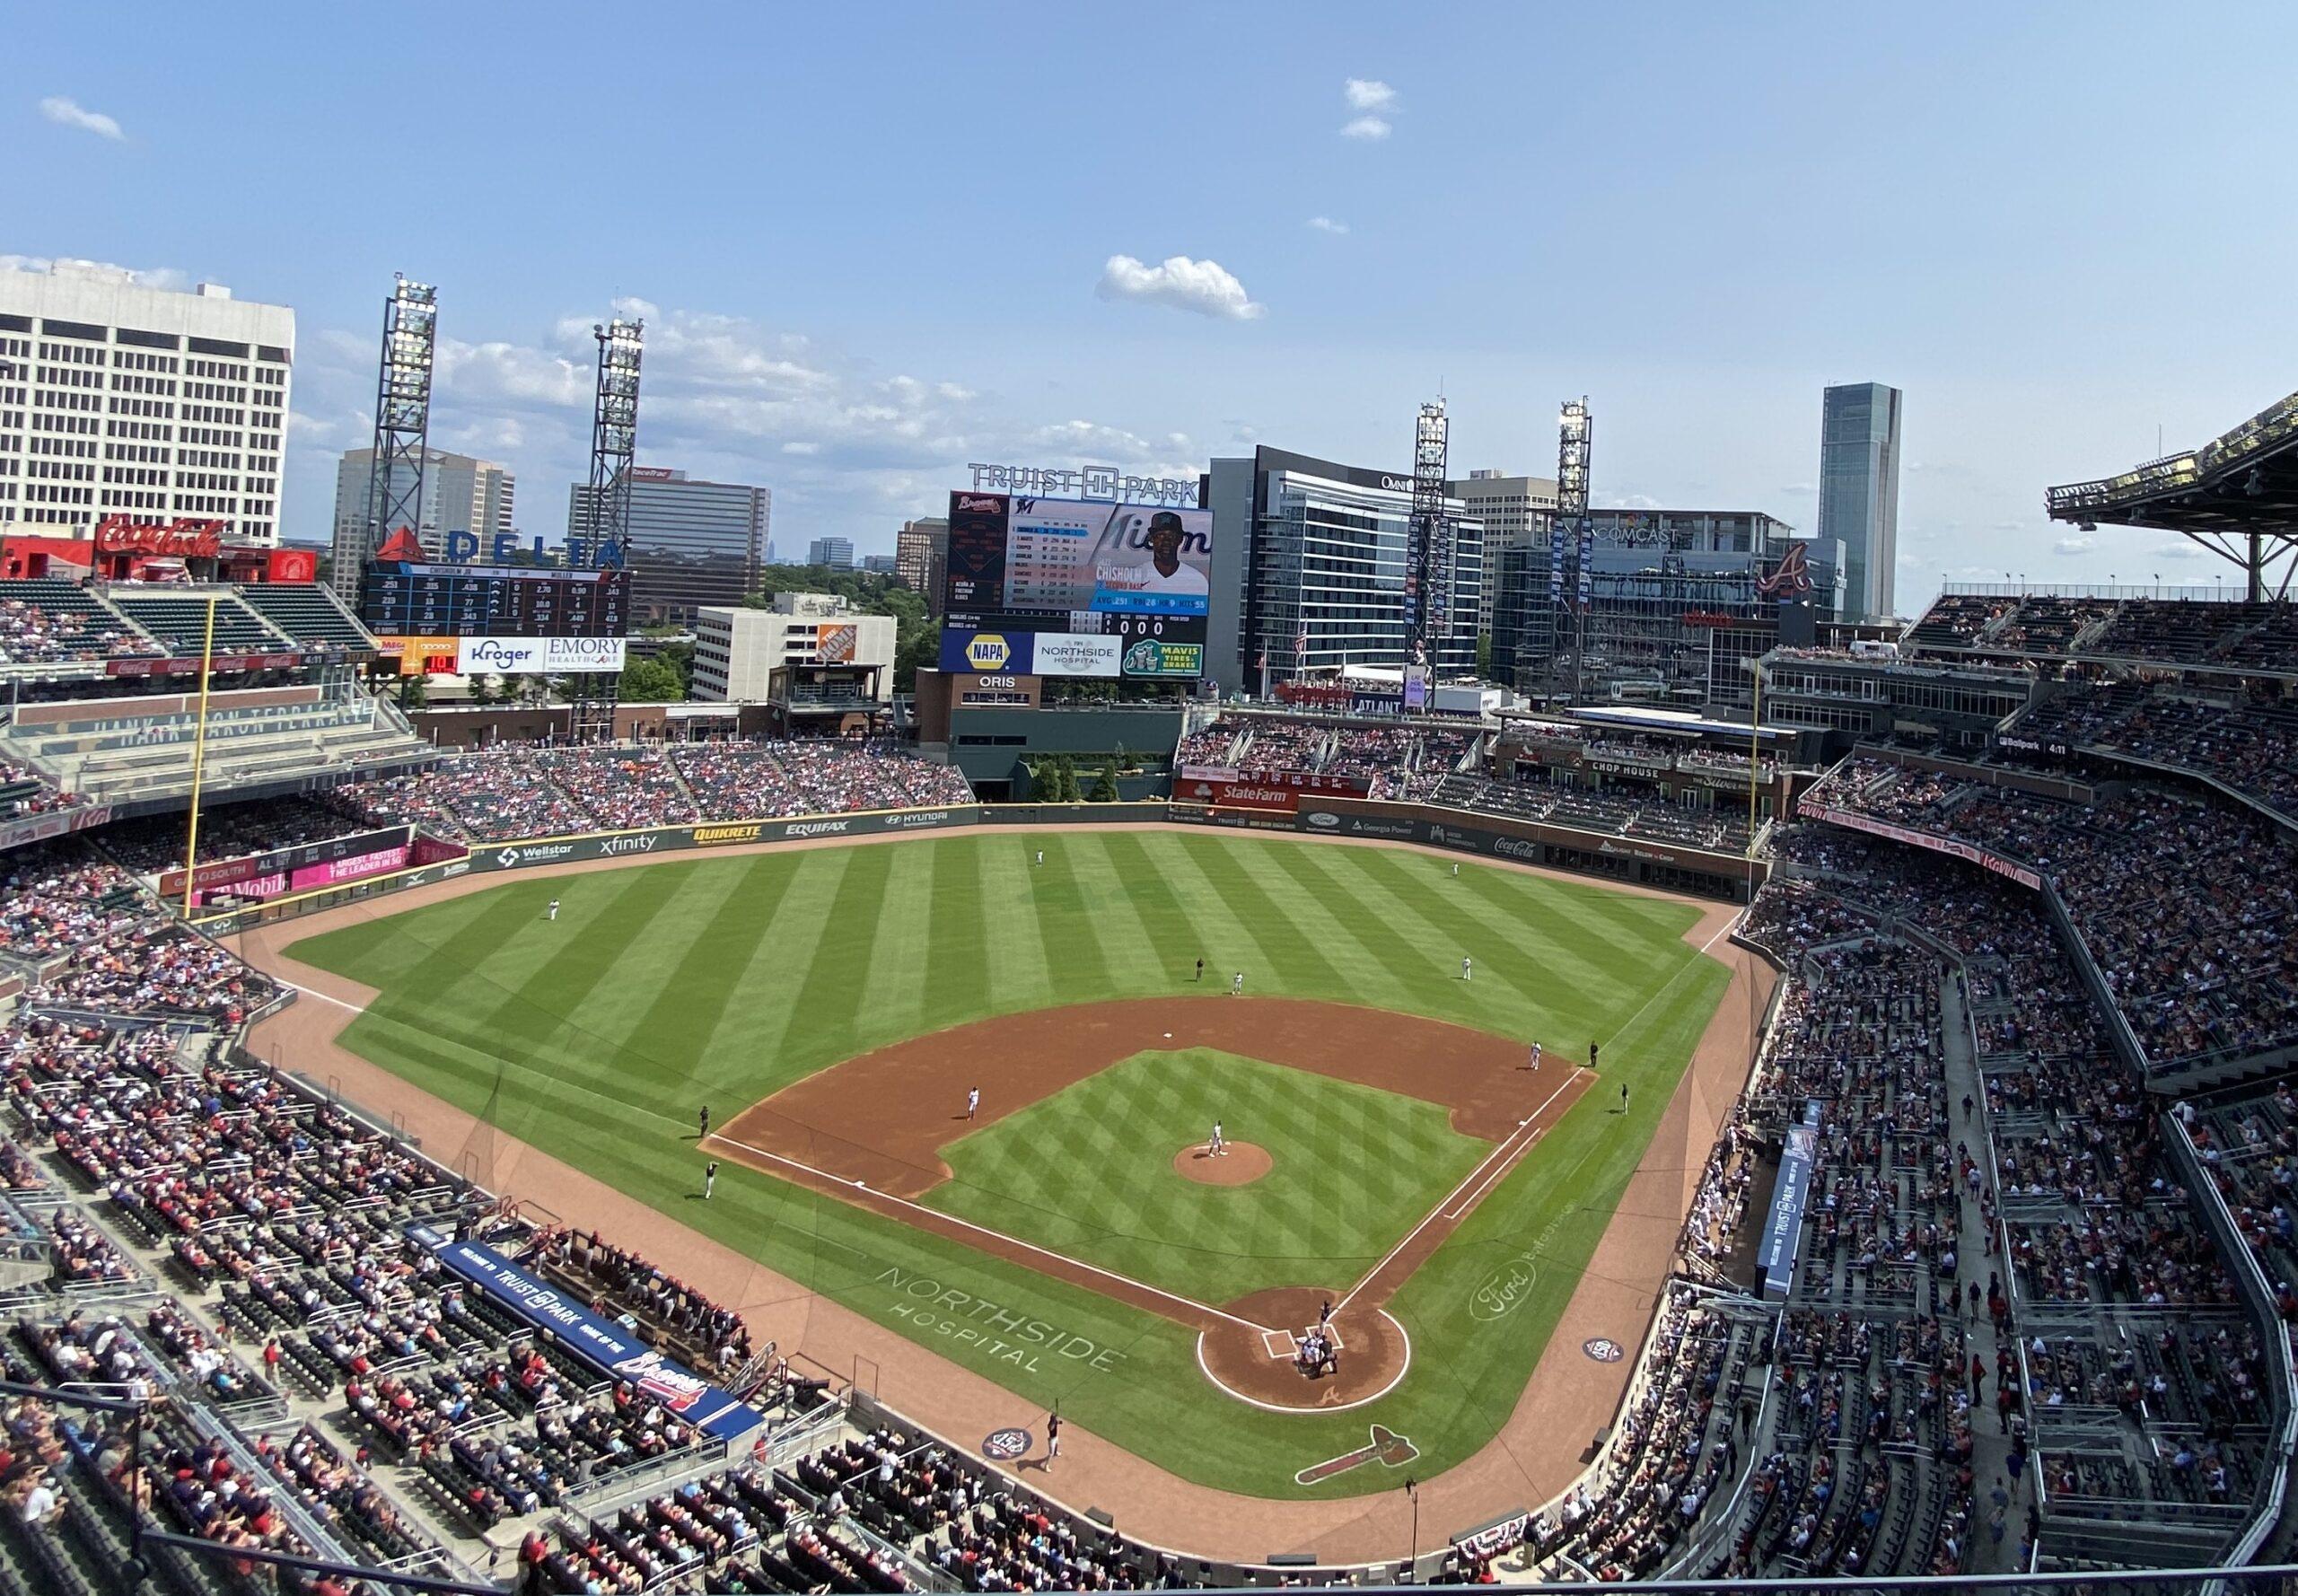 Truist Park, home of the Atlanta Braves